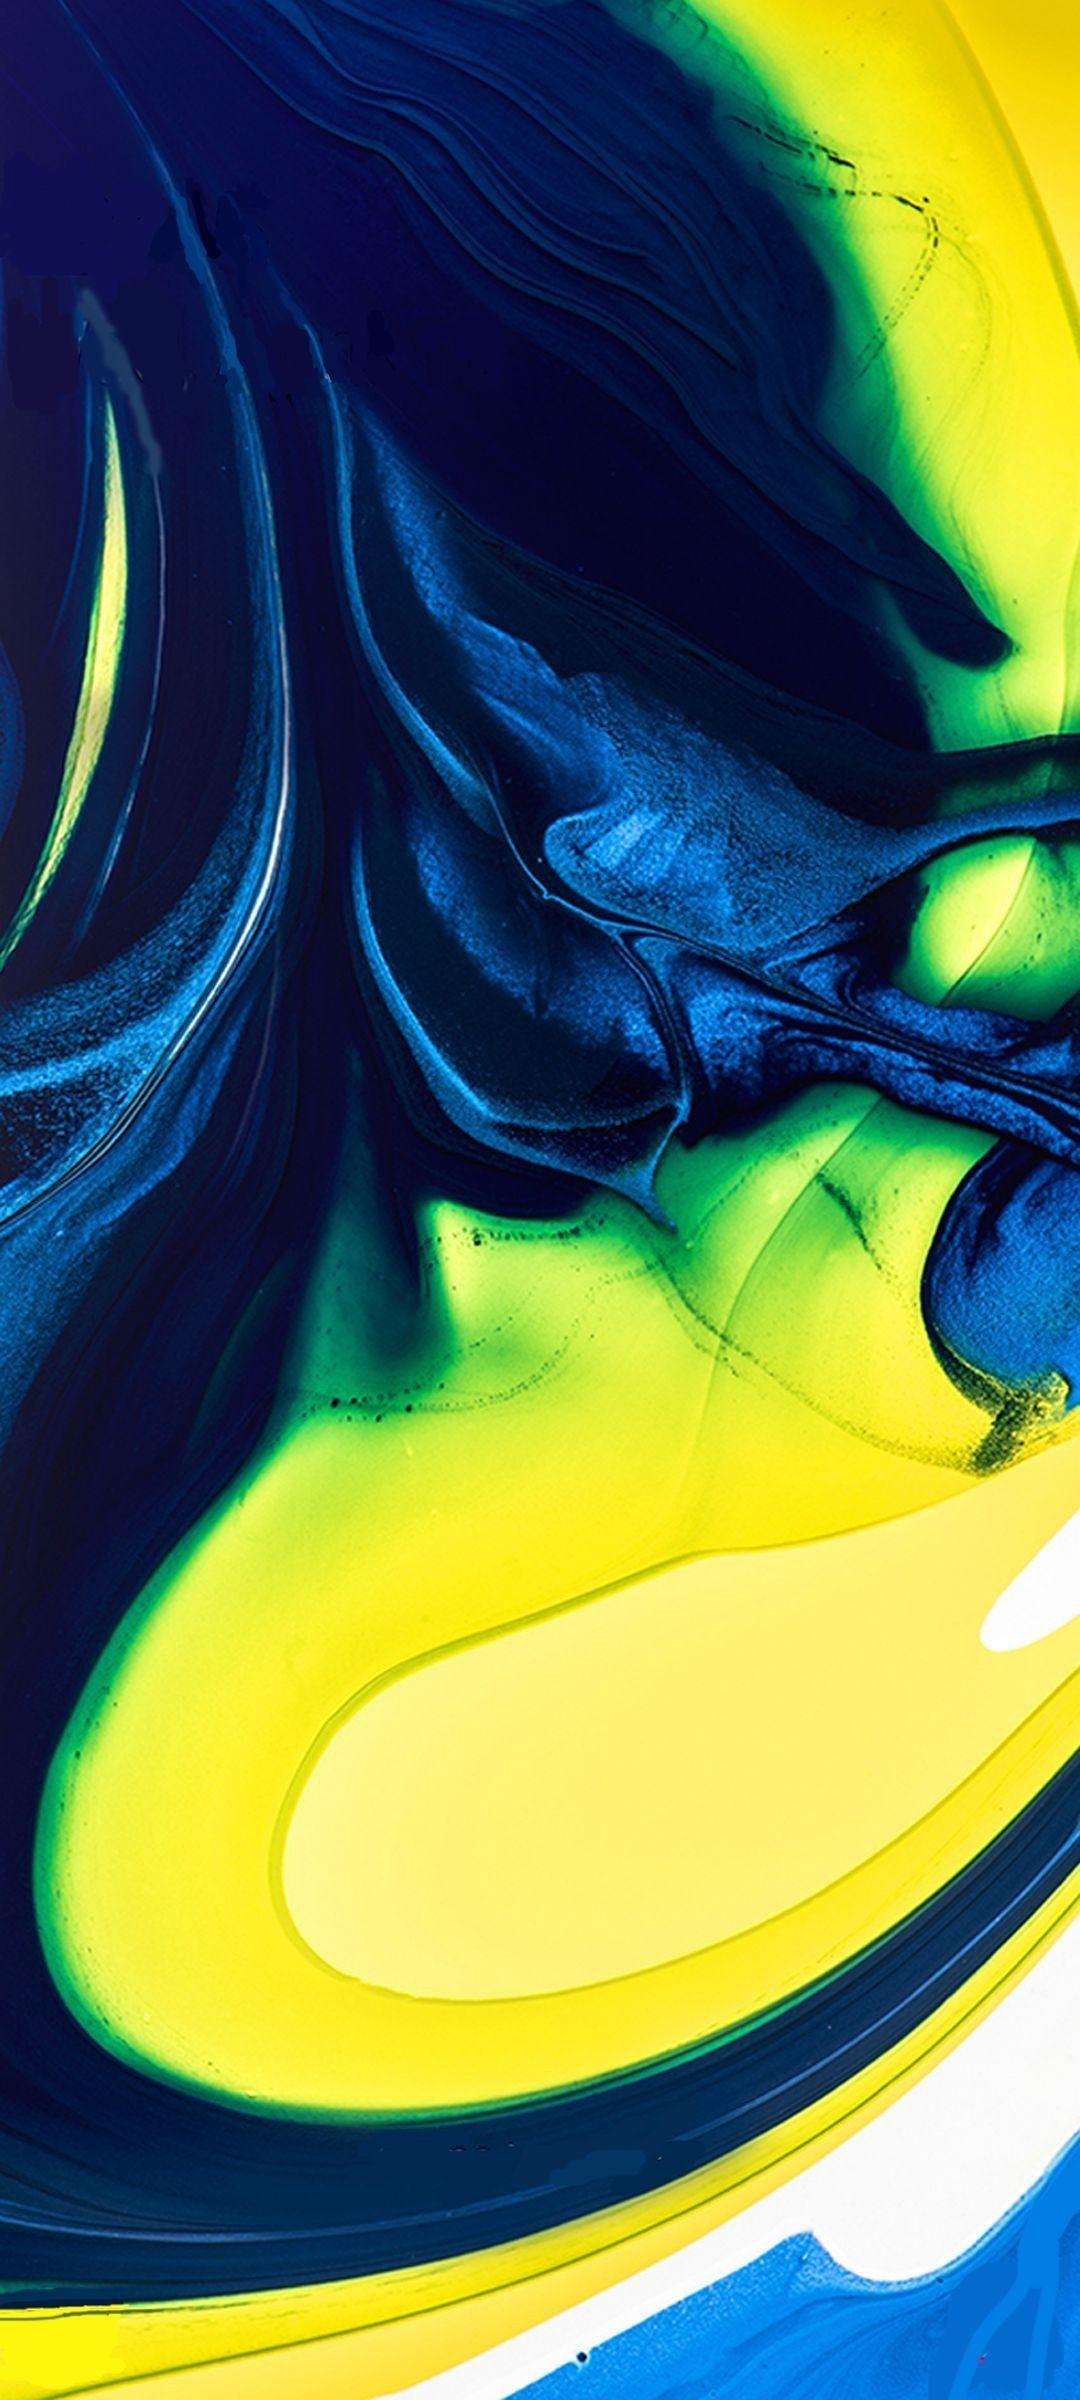 Pin Oleh Reidinal Moreno Di Stock Wallpapers Kertas Dinding Gambar Pemandangan Khayalan